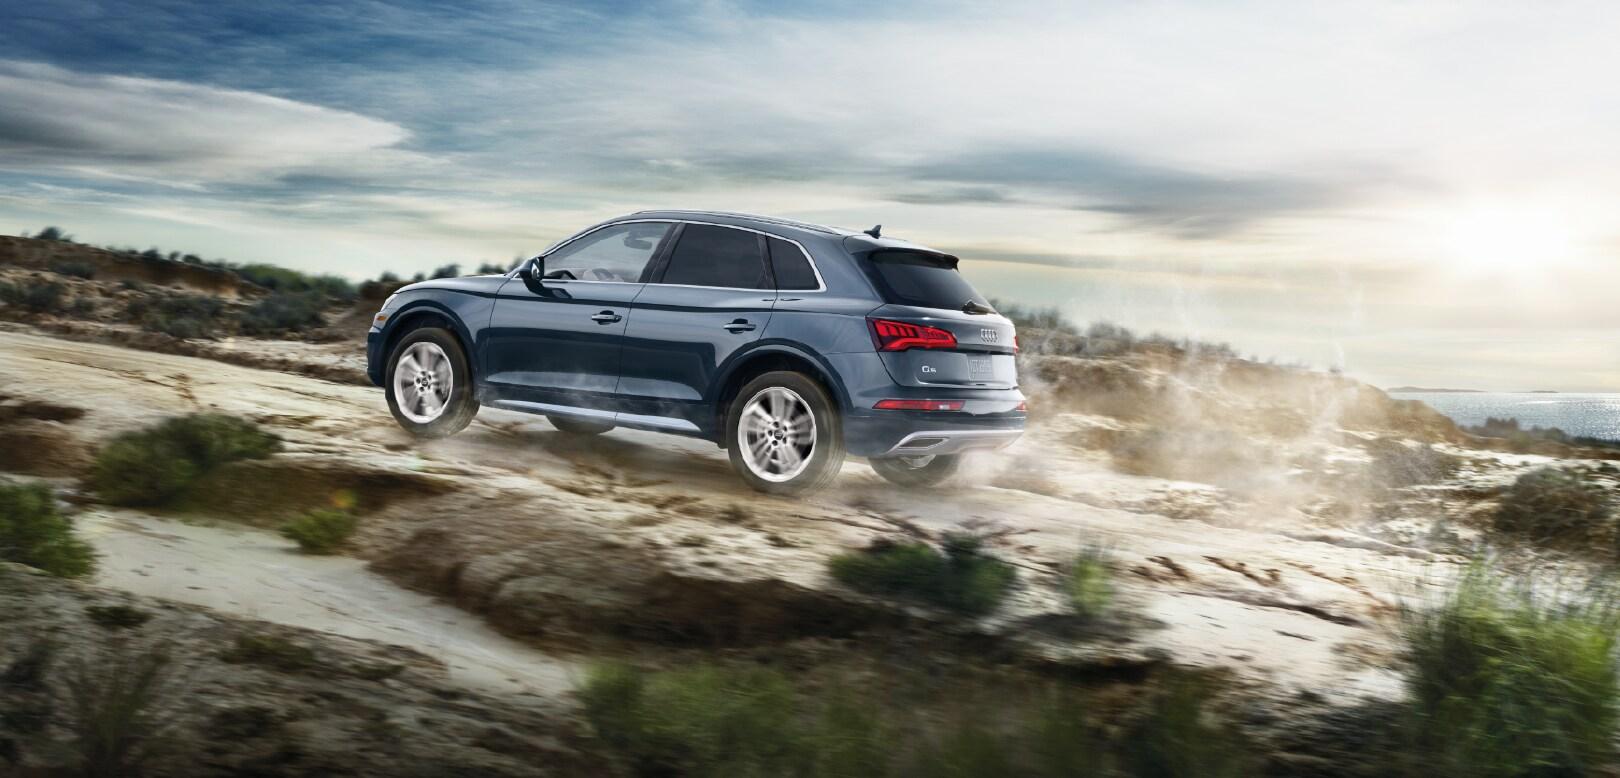 Audi Palo Alto New Audi Dealership In Palo Alto CA - Audi palo alto